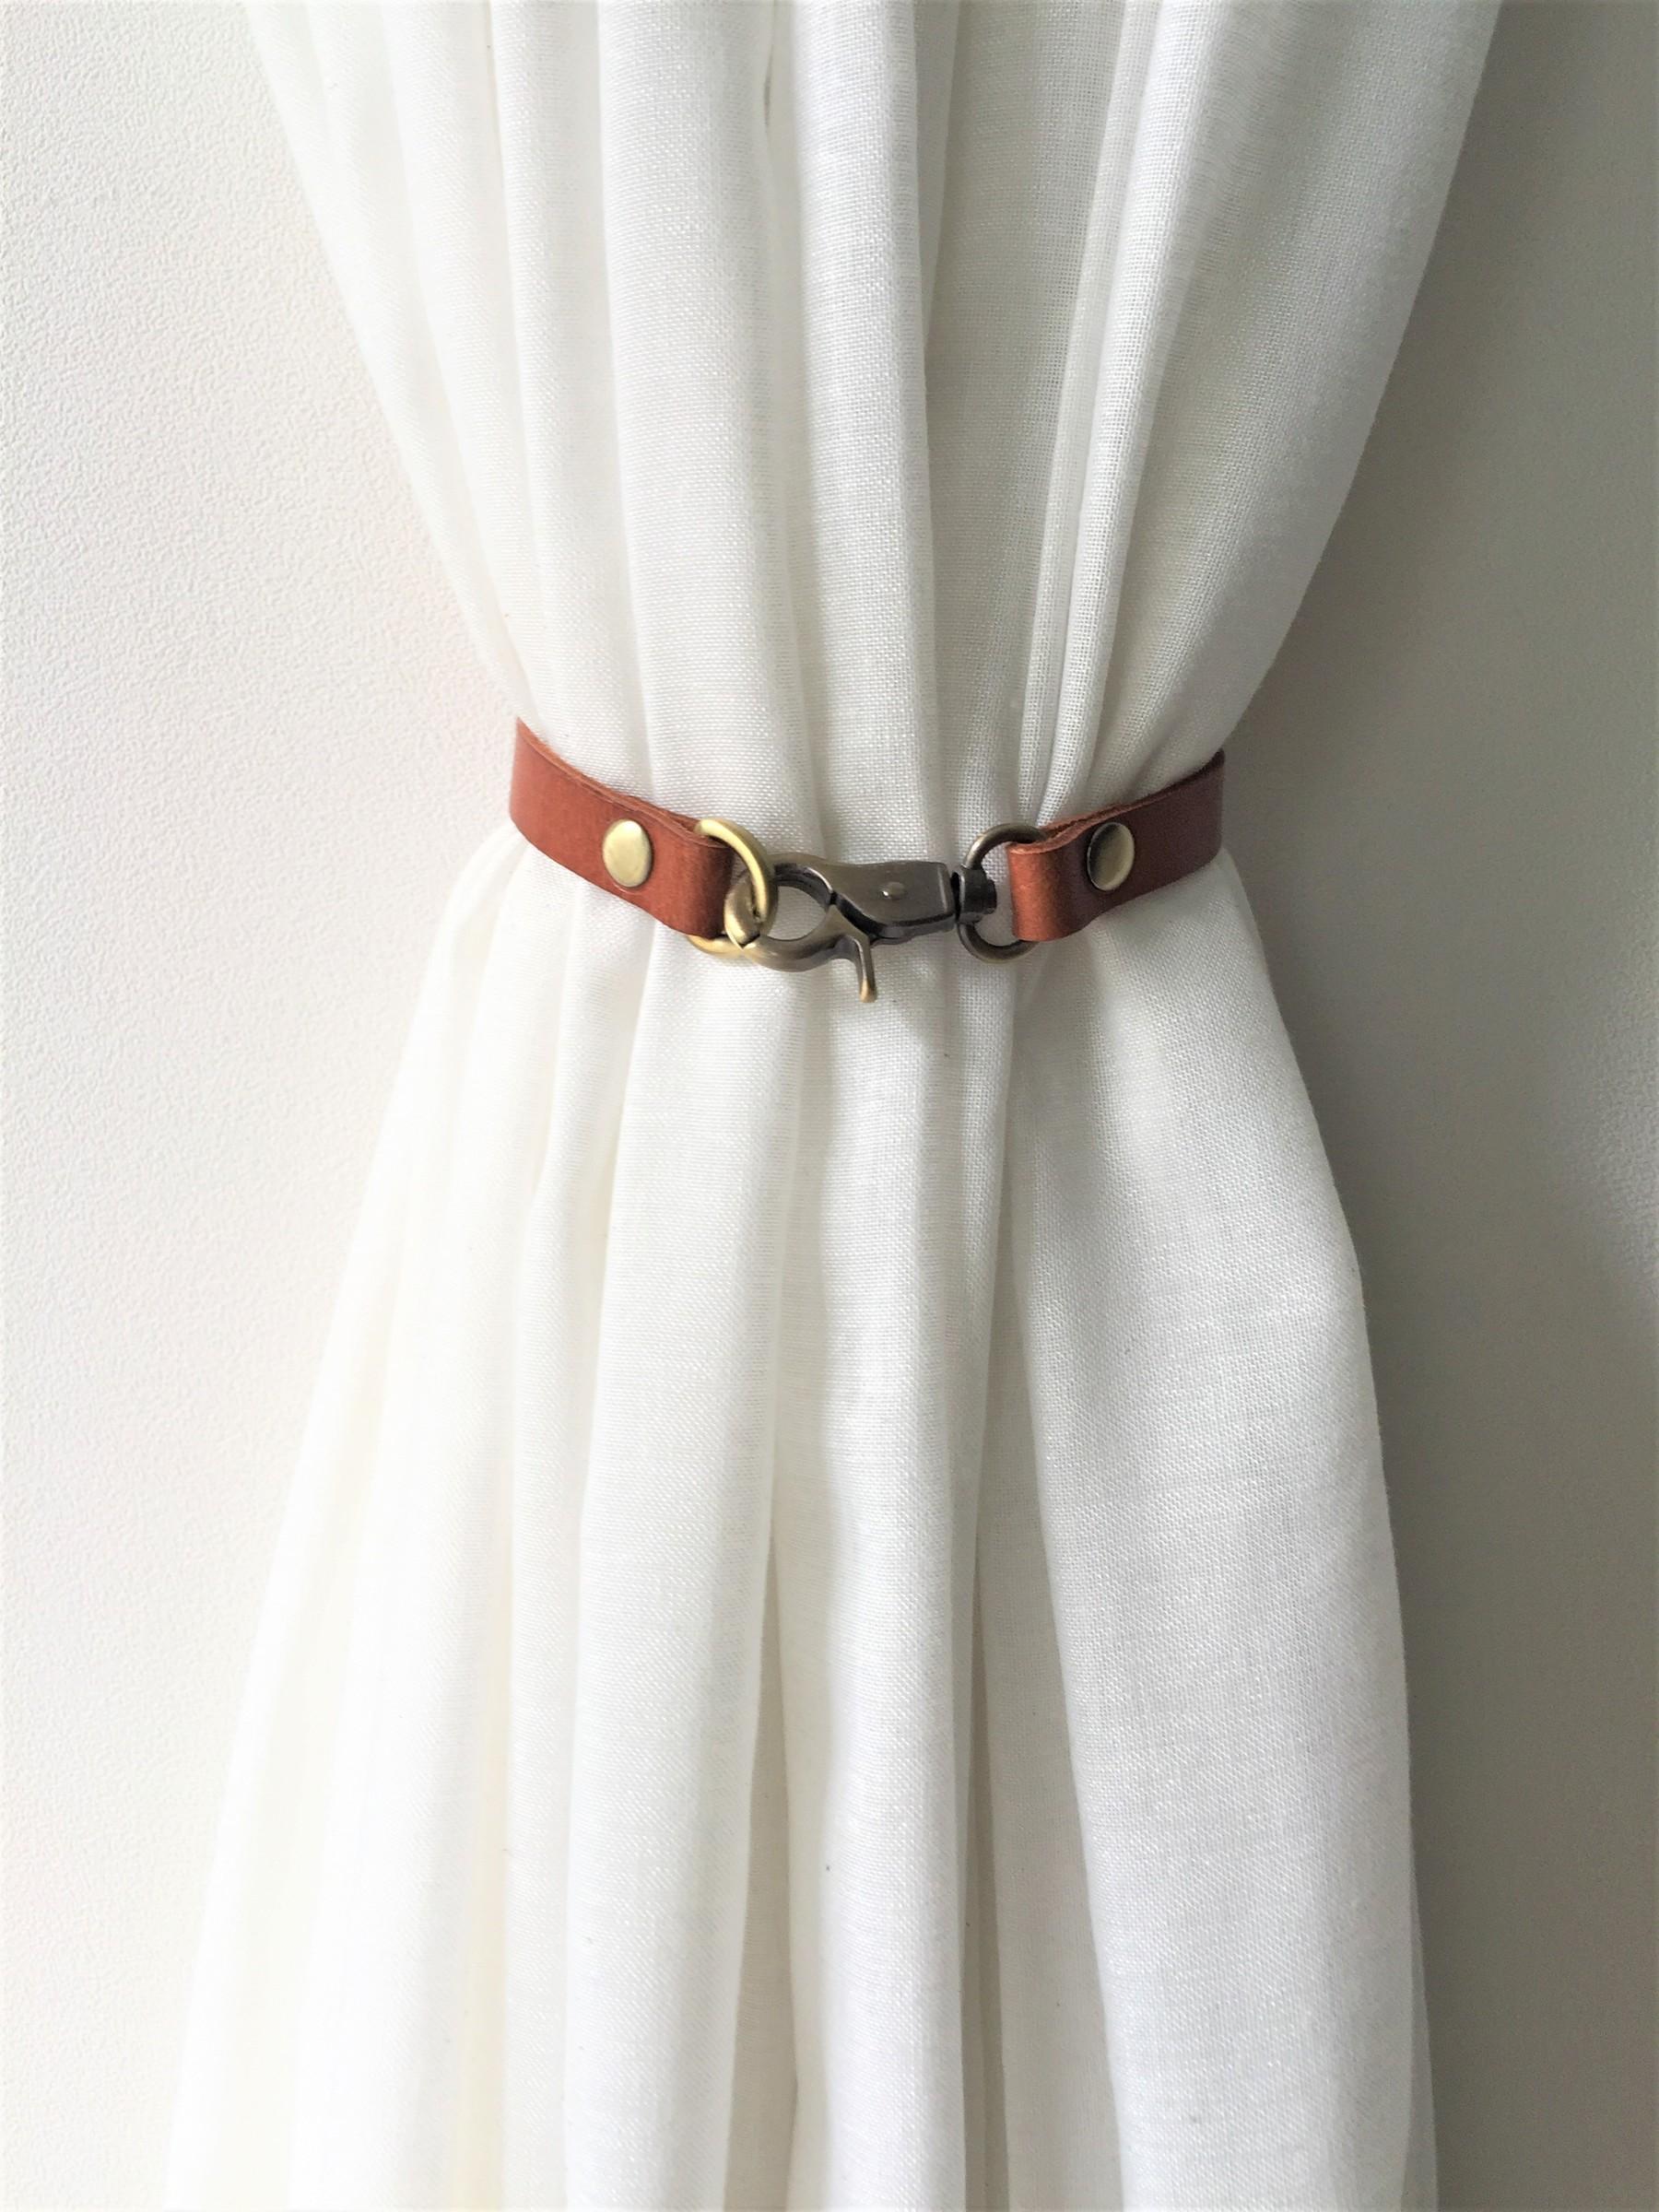 16mm leather curtain tie back elegant curtain tieback modern decor